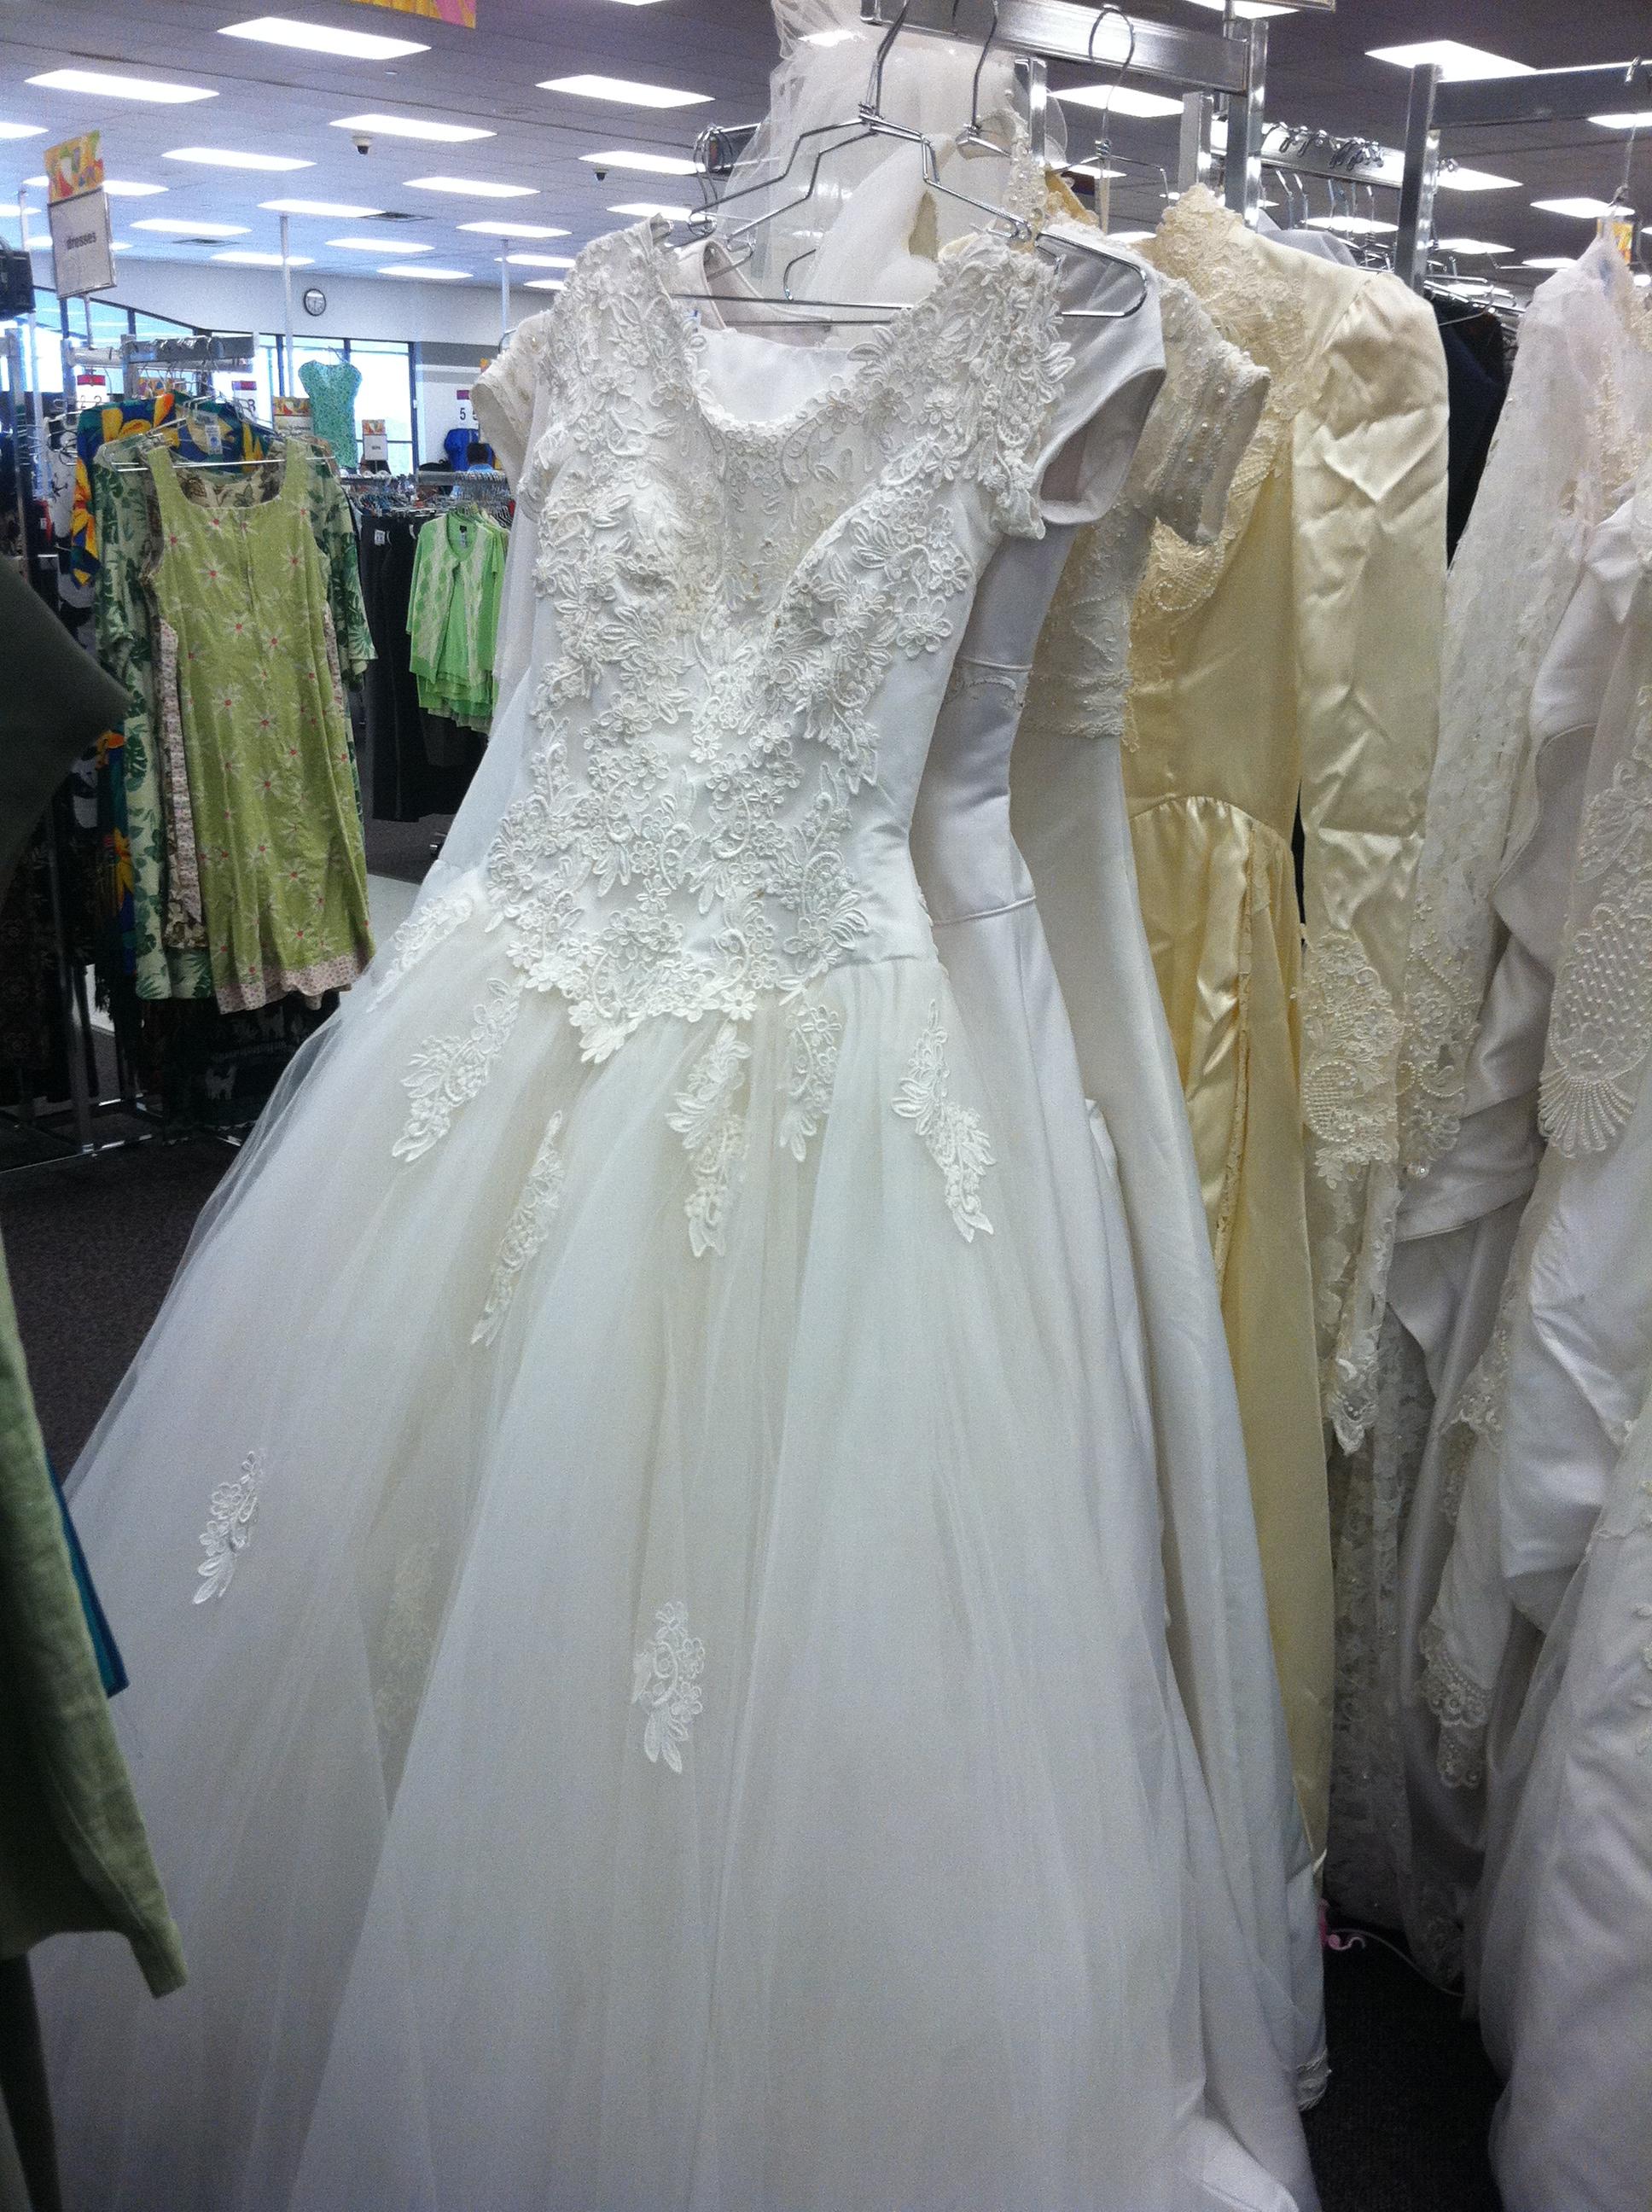 wedding dresses stores wedding dresses websites Wedding Dresses Stores 87